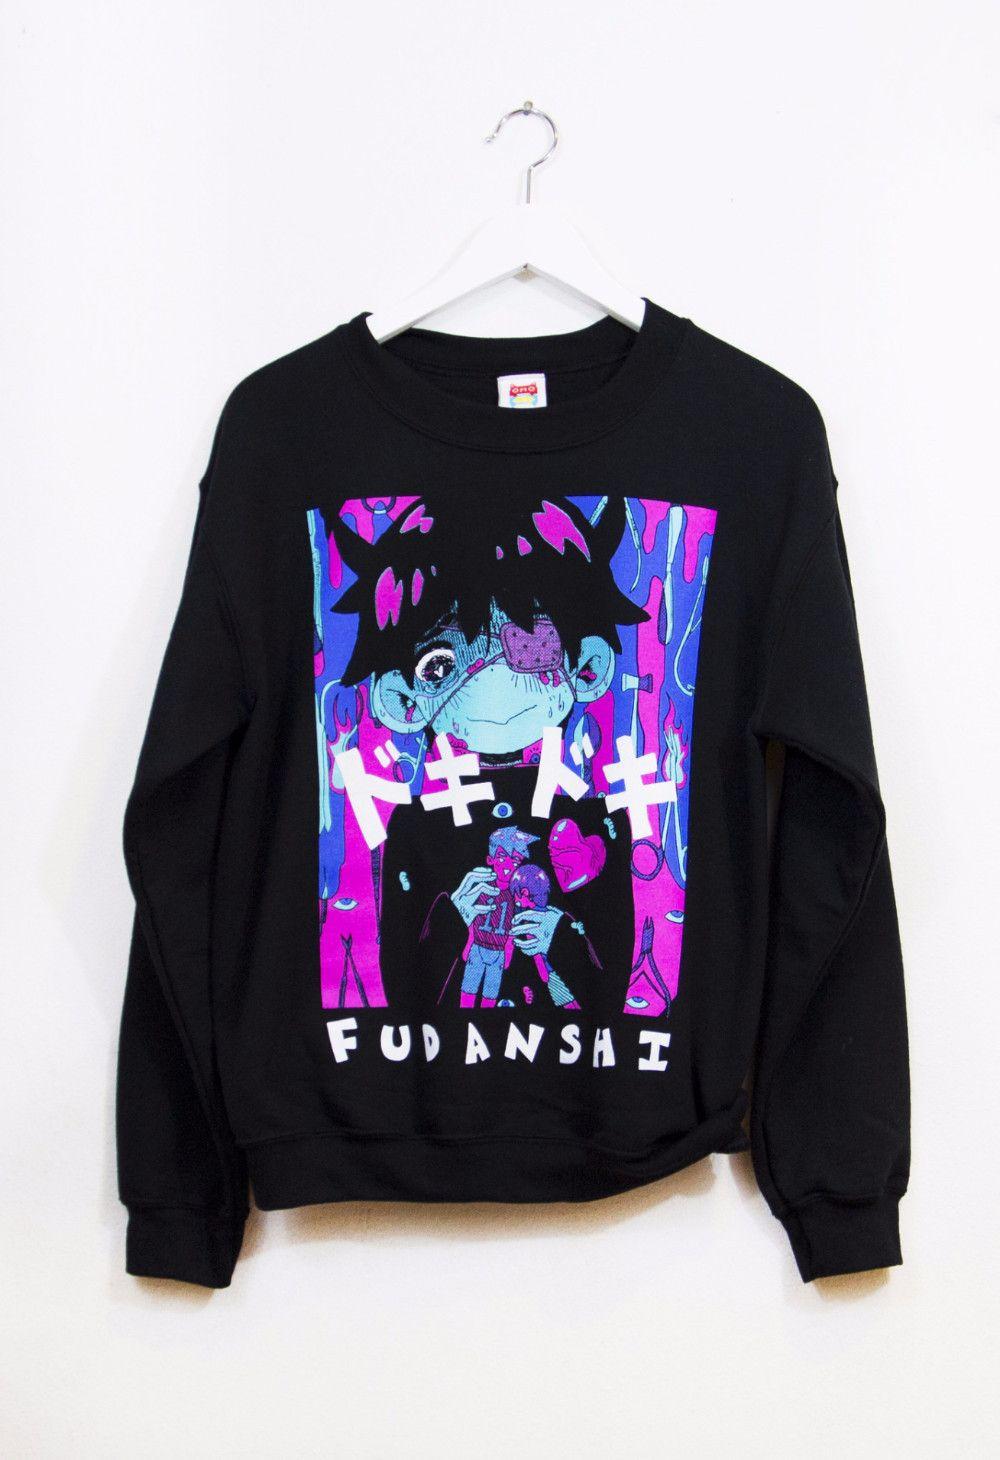 Sweater Fashion goth Sweaters FUDANSHI Clothes pastel x4HwC11Sq